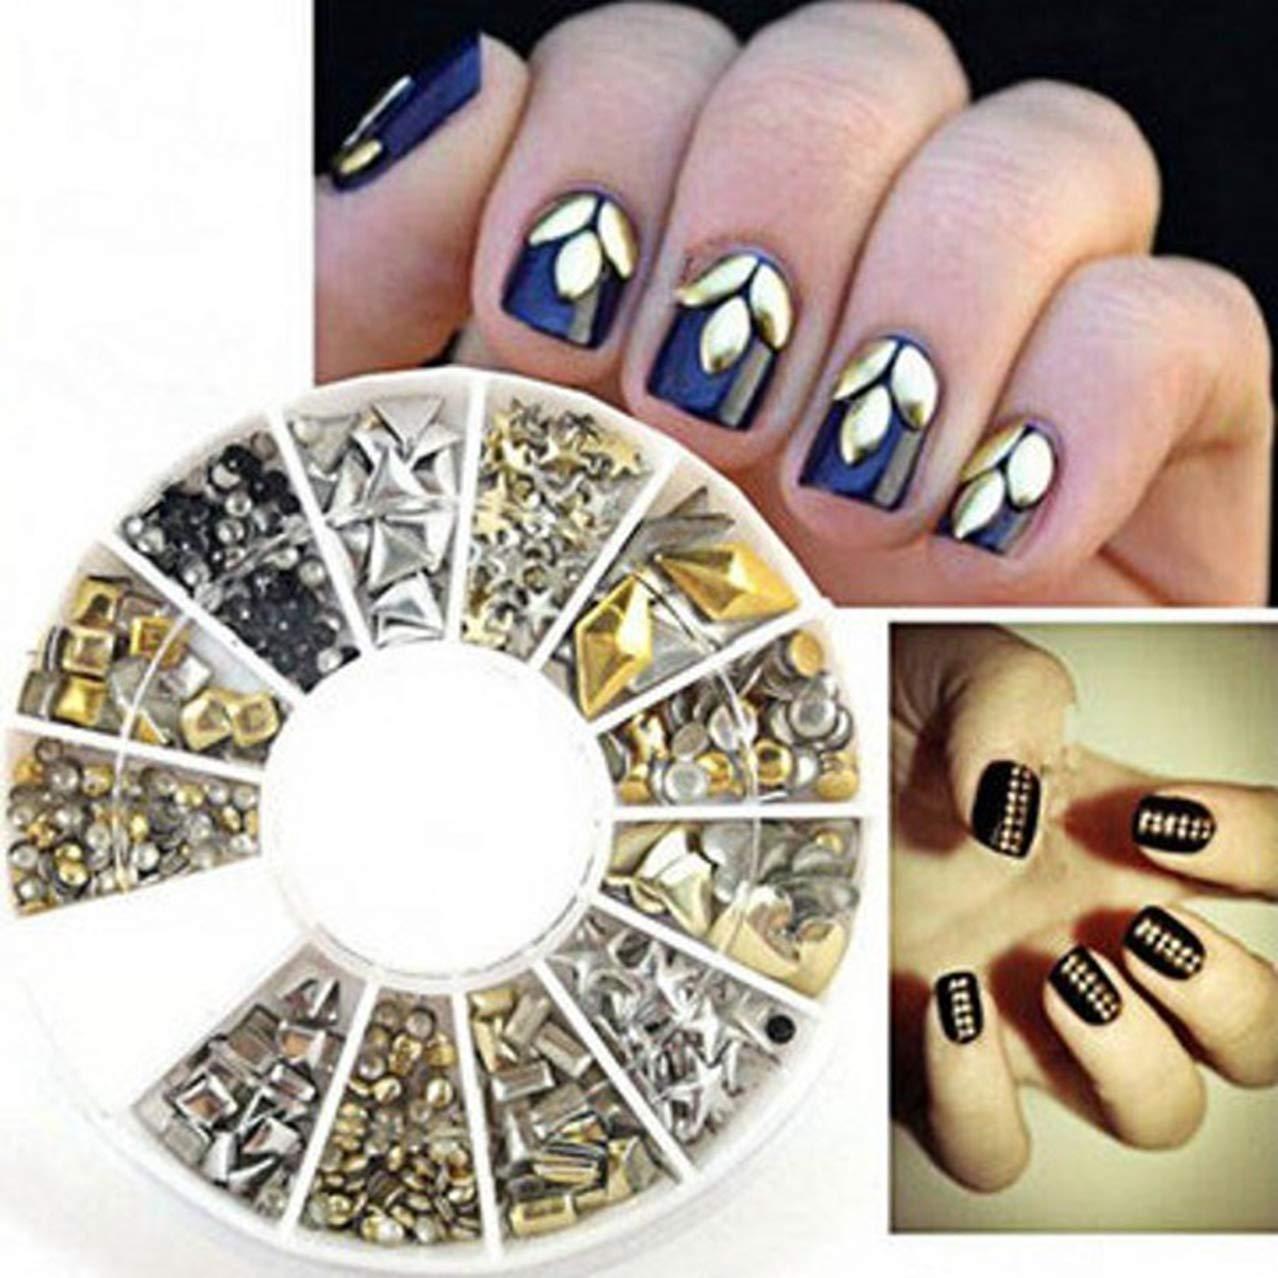 Amazon.com 1 Pcs 3D Studs Gems Metal Nails Art Rhinestones